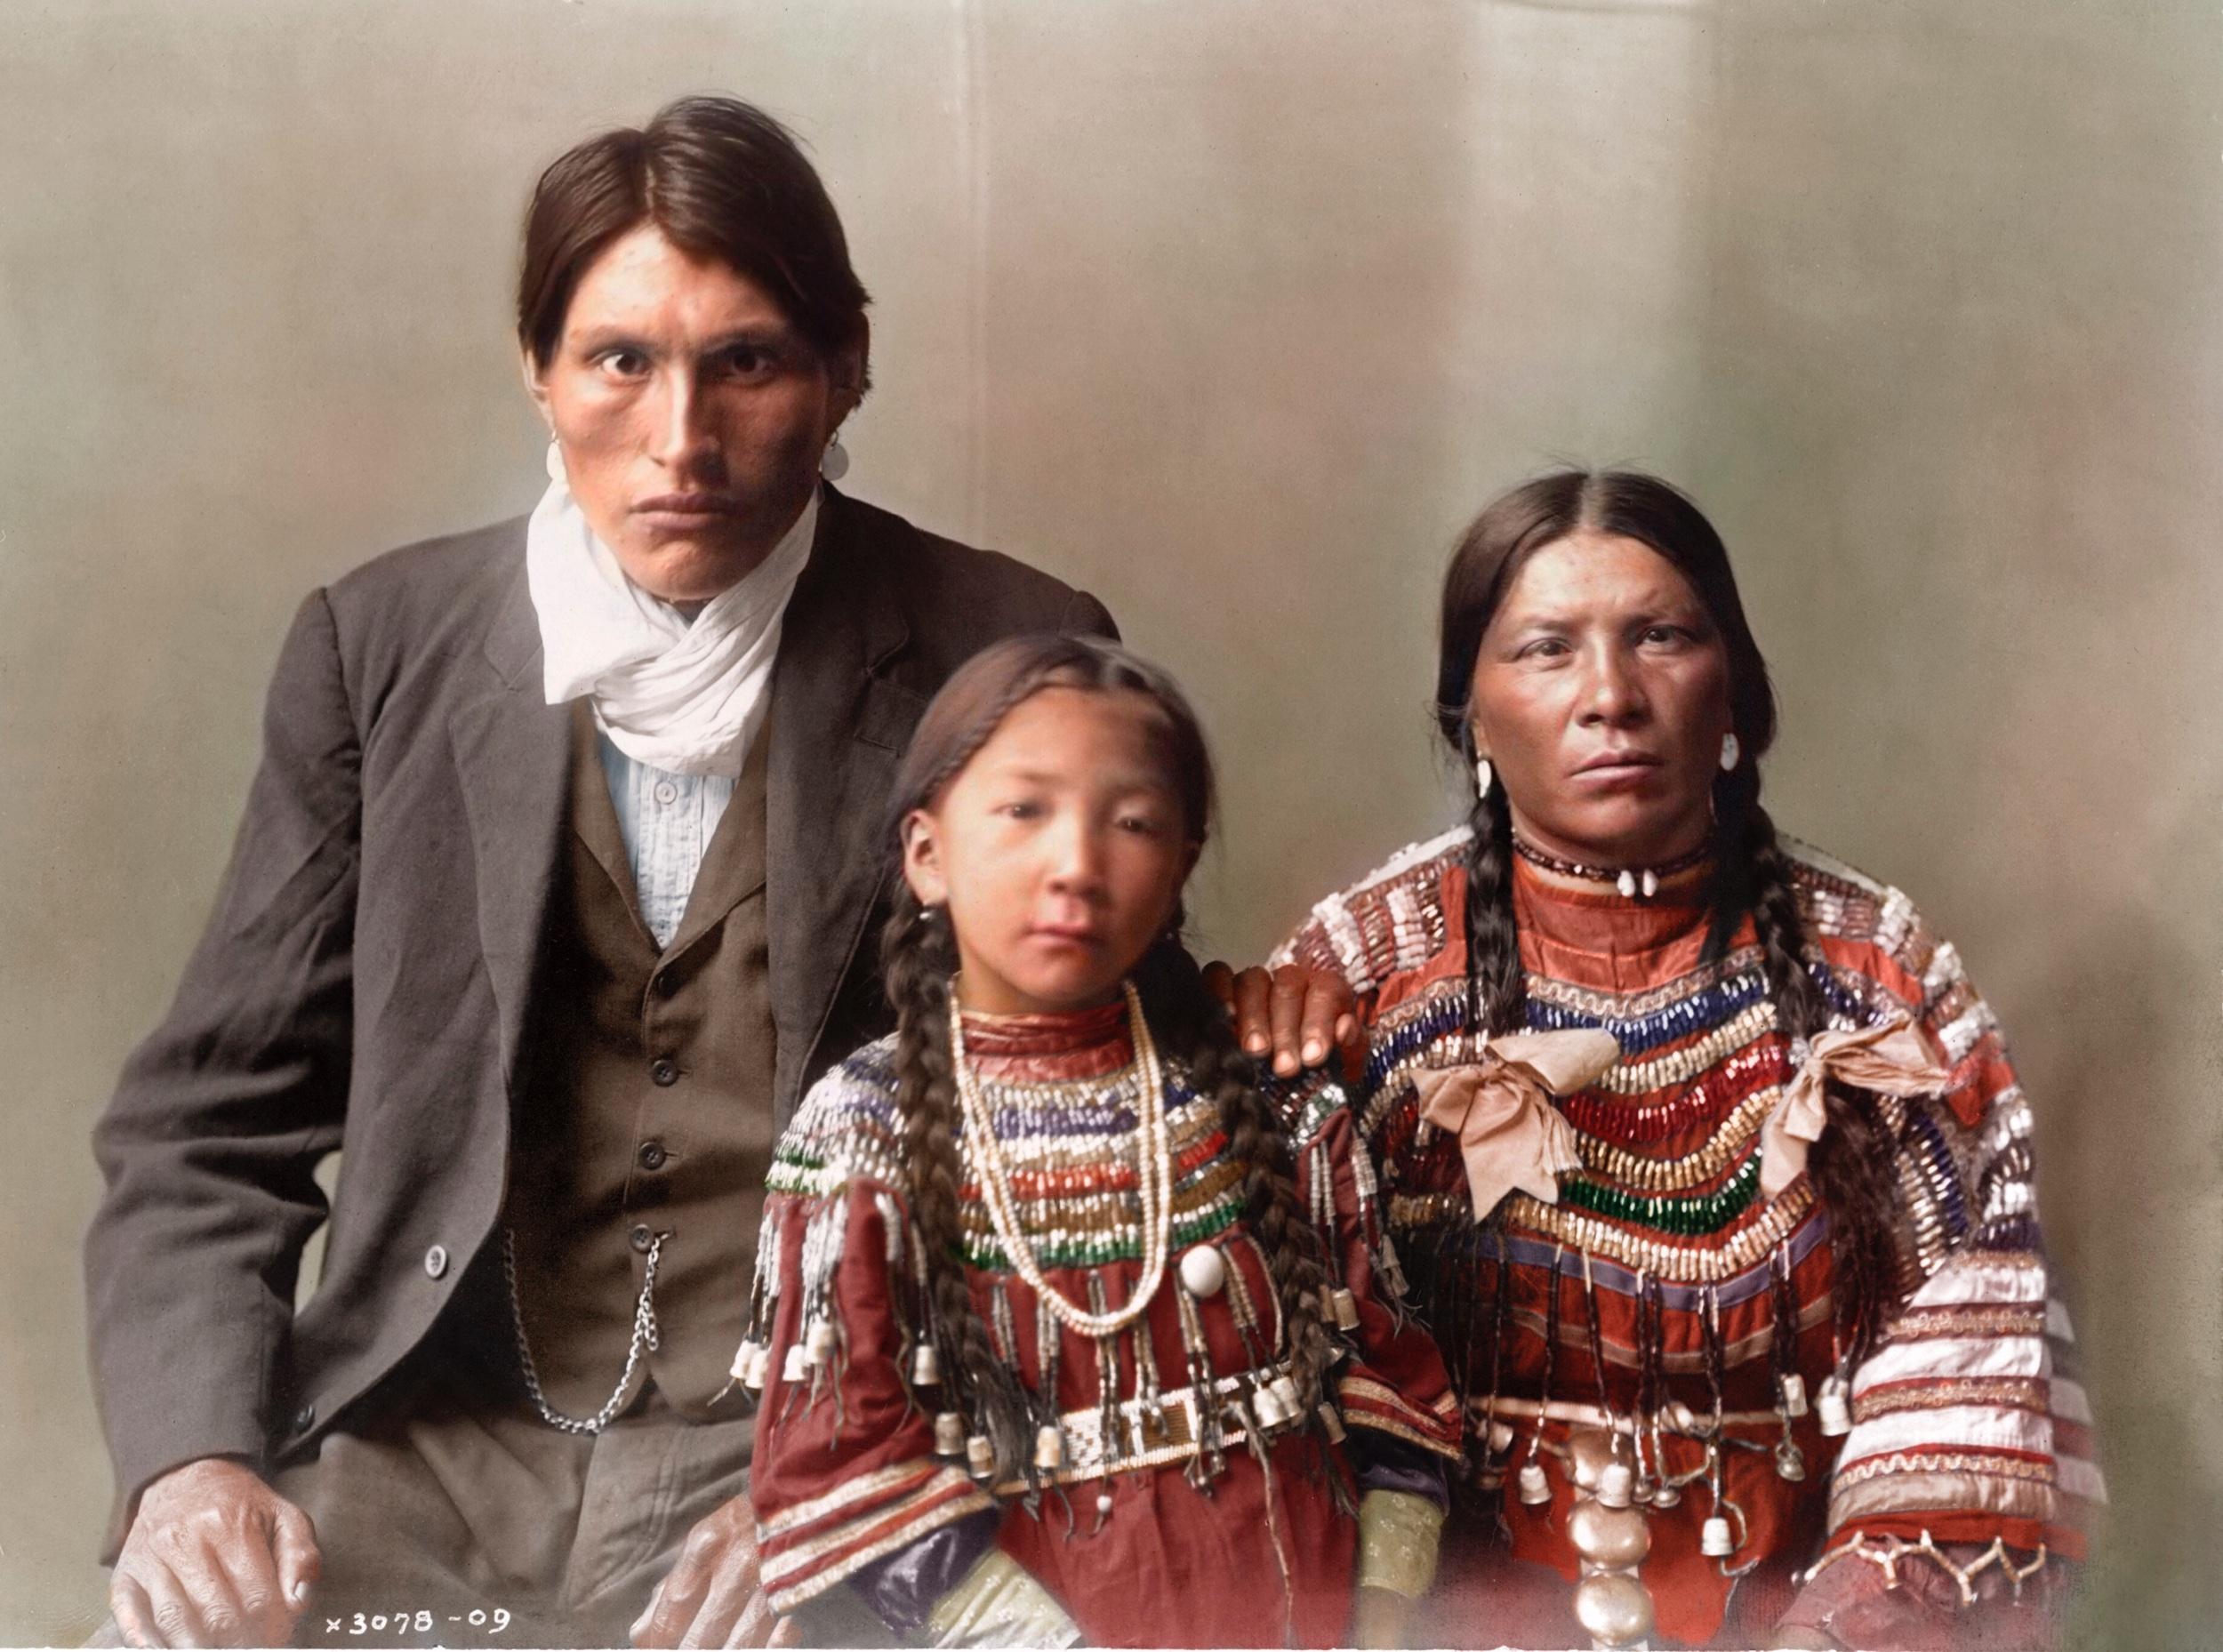 The Piegan Family of Reuben Black Boy (1910)